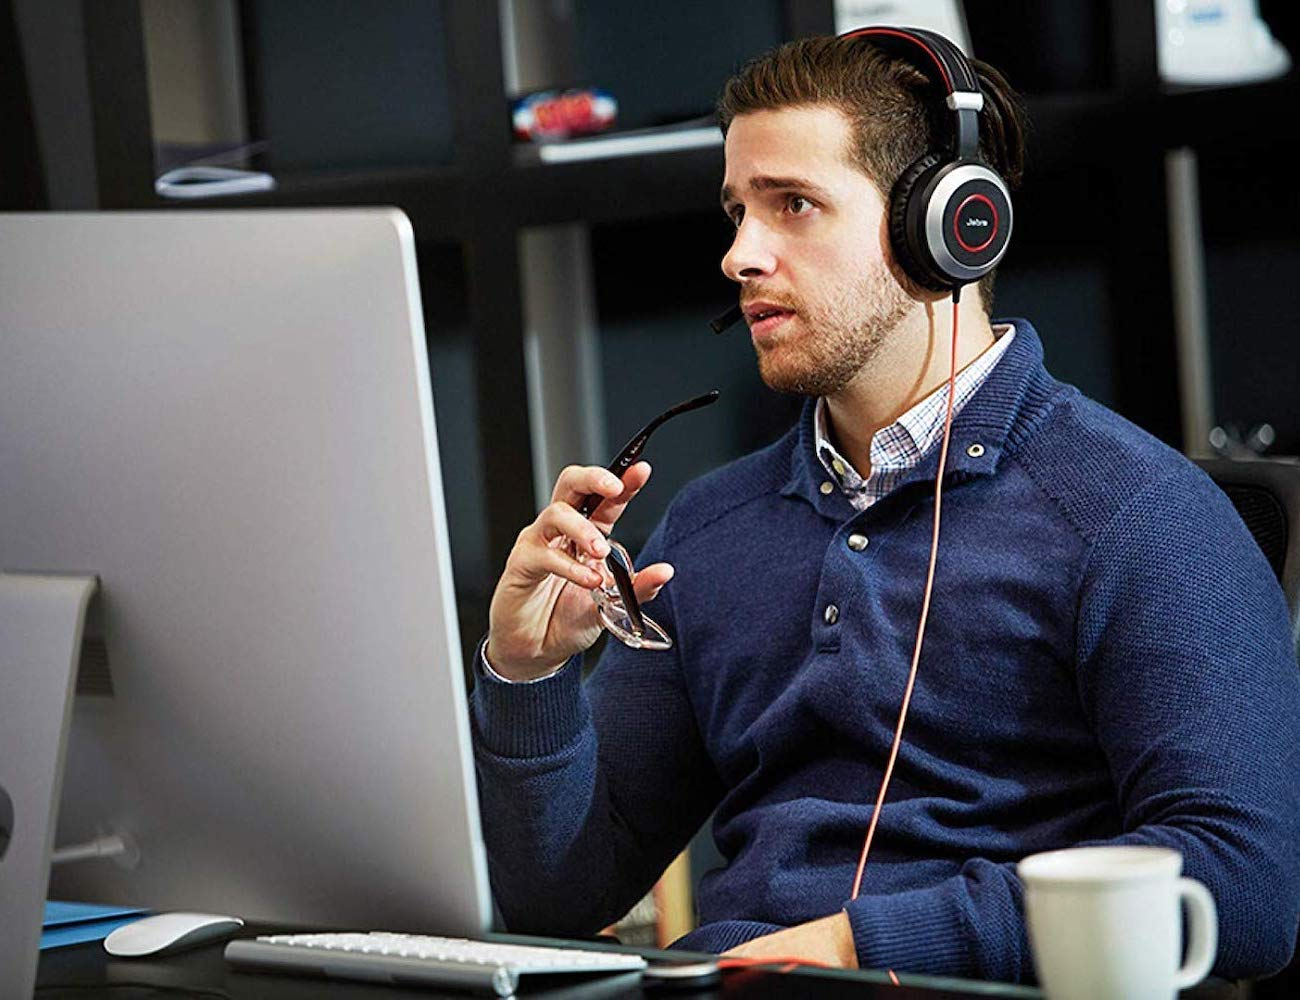 Jabra Evolve 80 Professional Stereo Headset